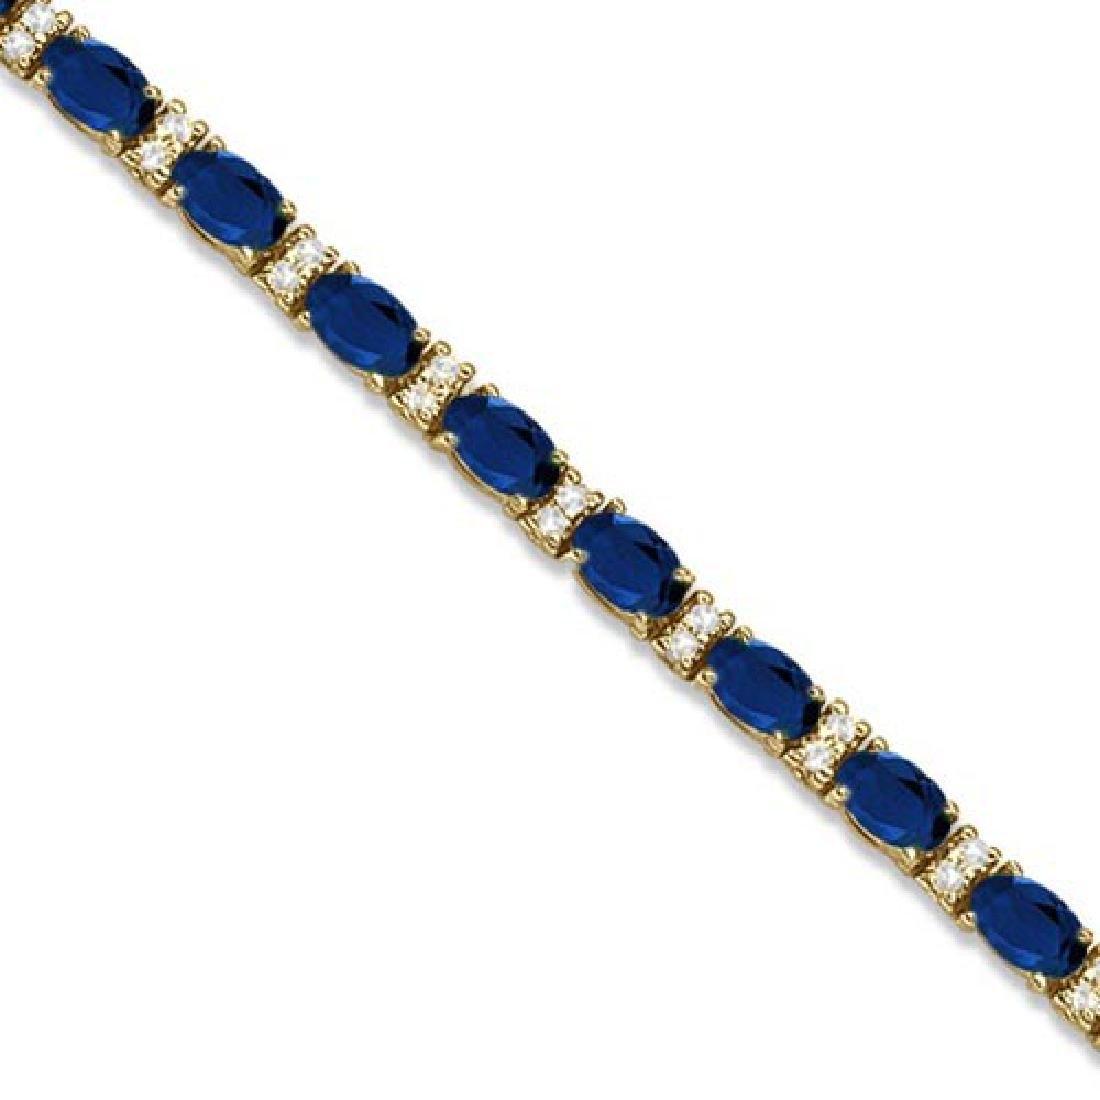 Diamond and Oval Cut Sapphire Tennis Bracelet 14k Yello